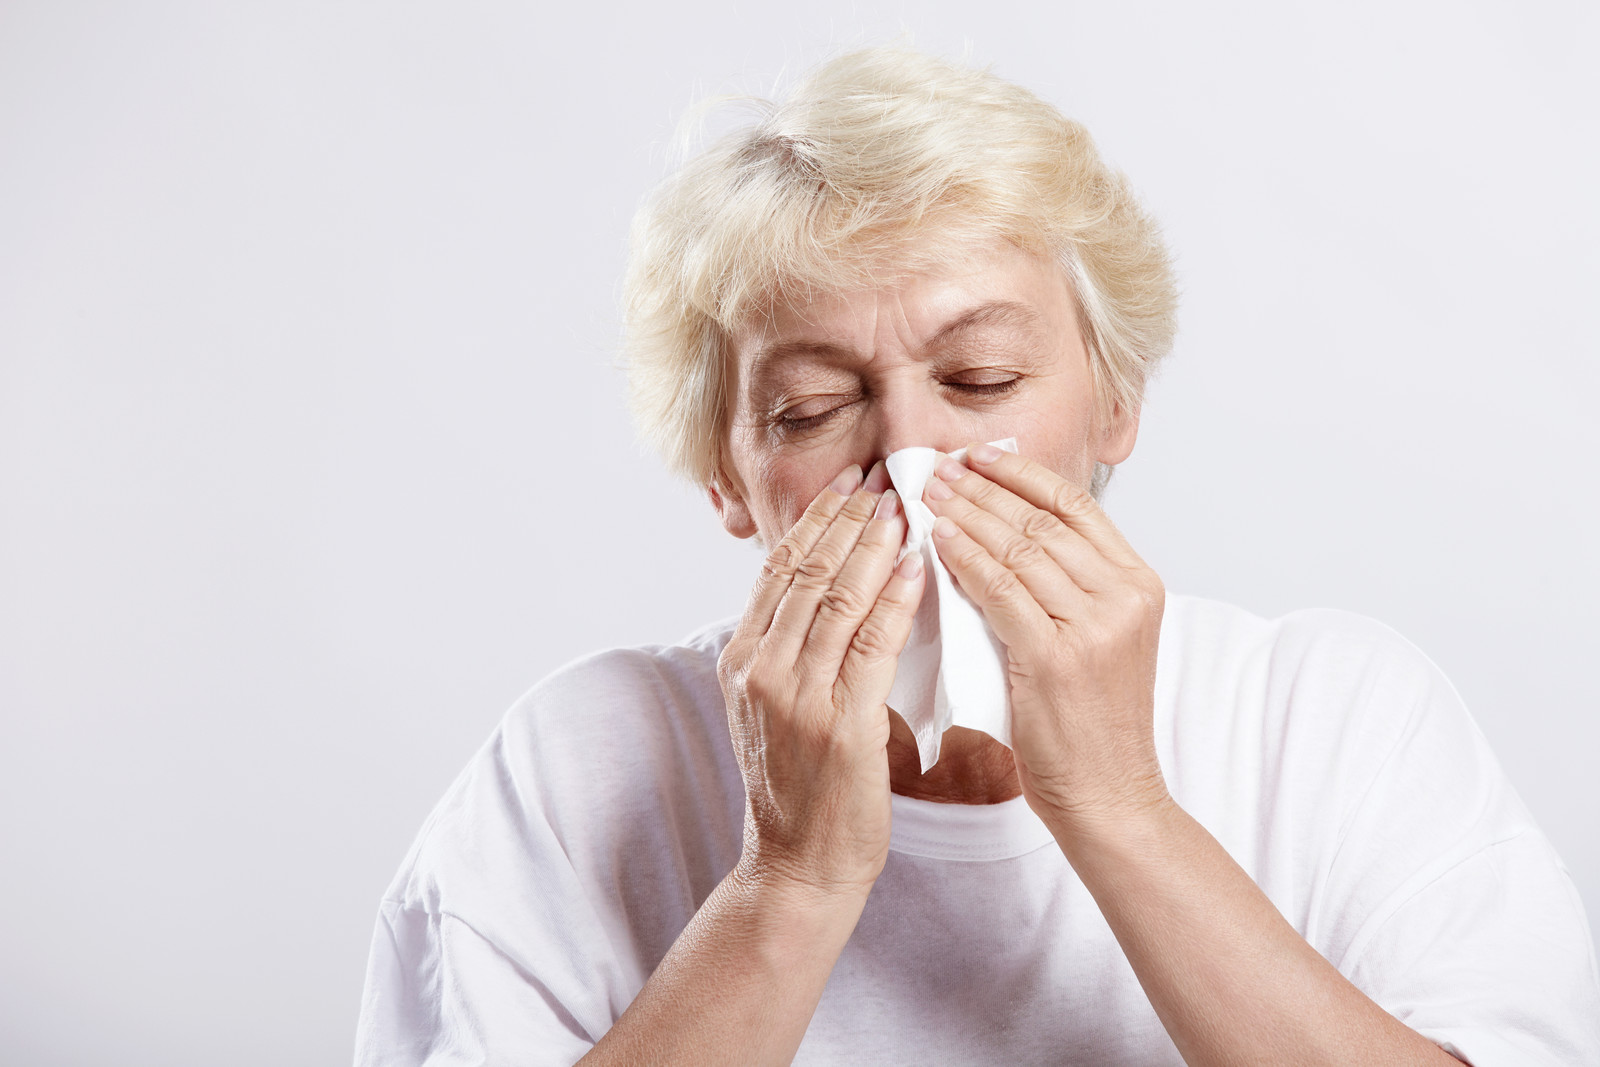 Runny Nose / Vasomotor rhinitis